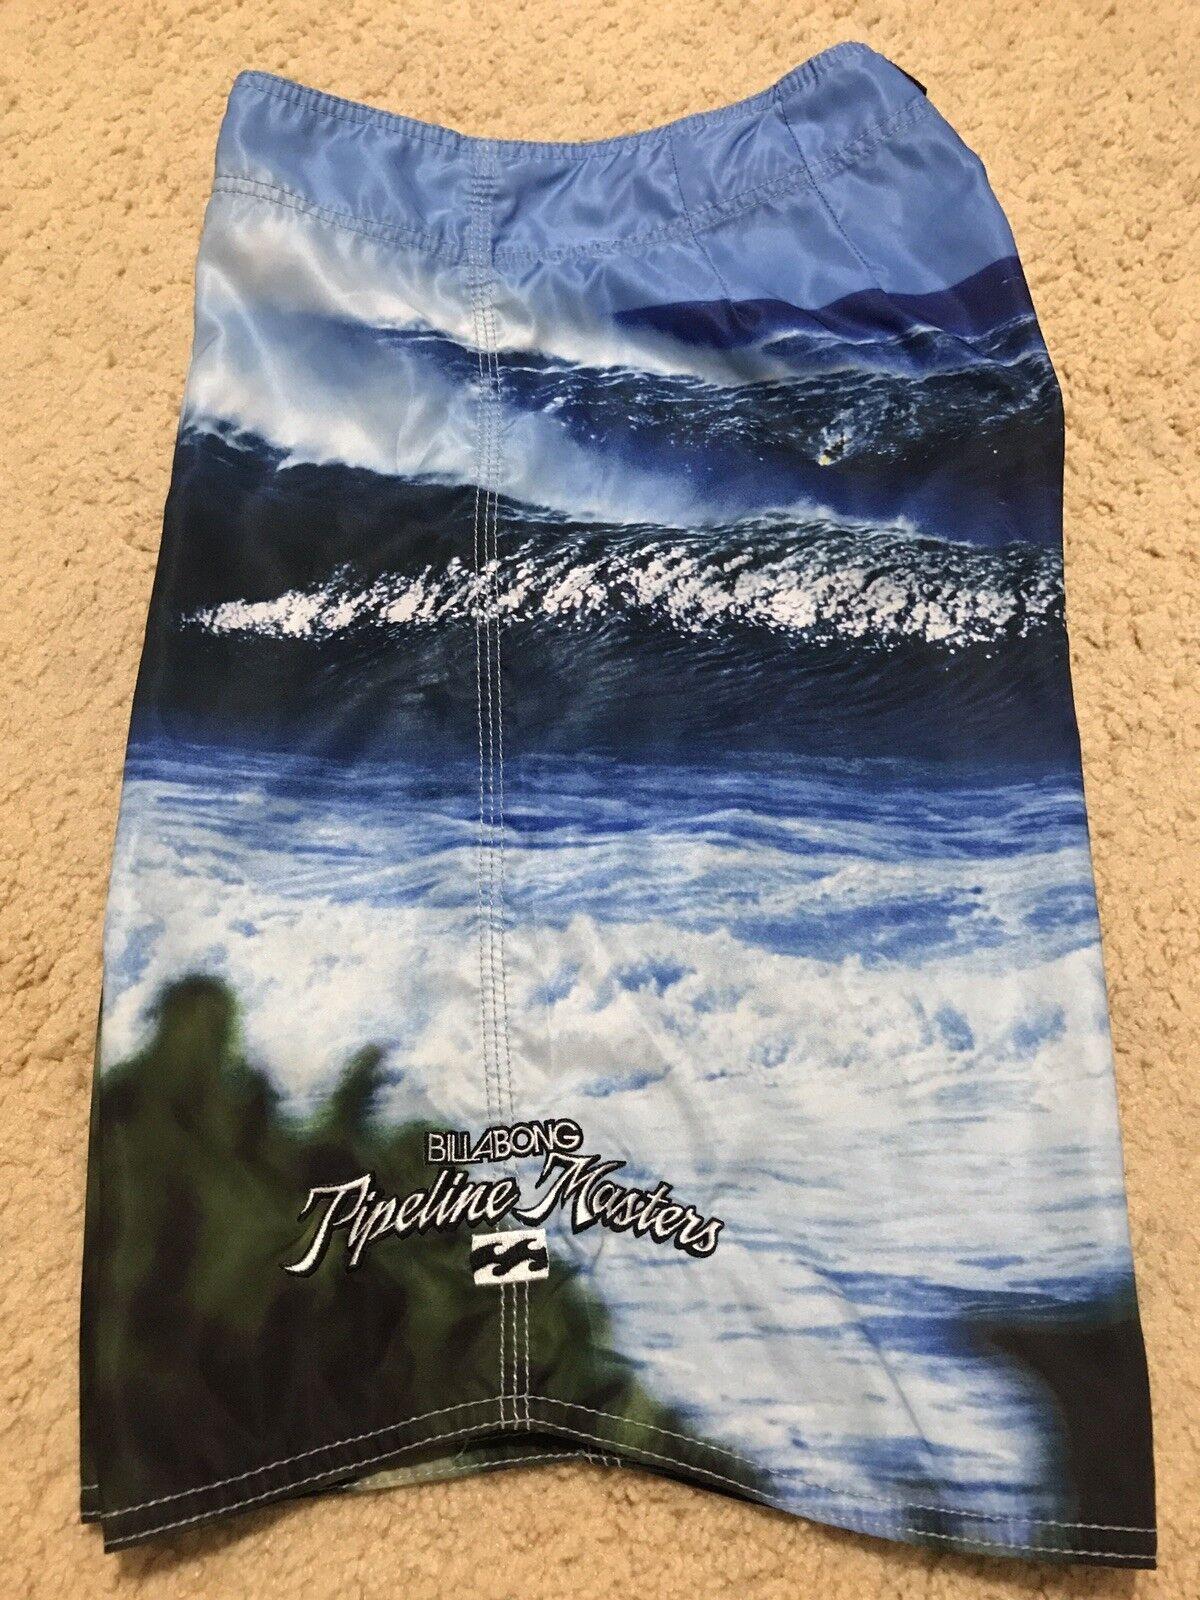 BILLABONG PIPE MASTERS VANS TRIPLE CROWN OF SURFING 34 RARE BOARD SHORTS HAWAII